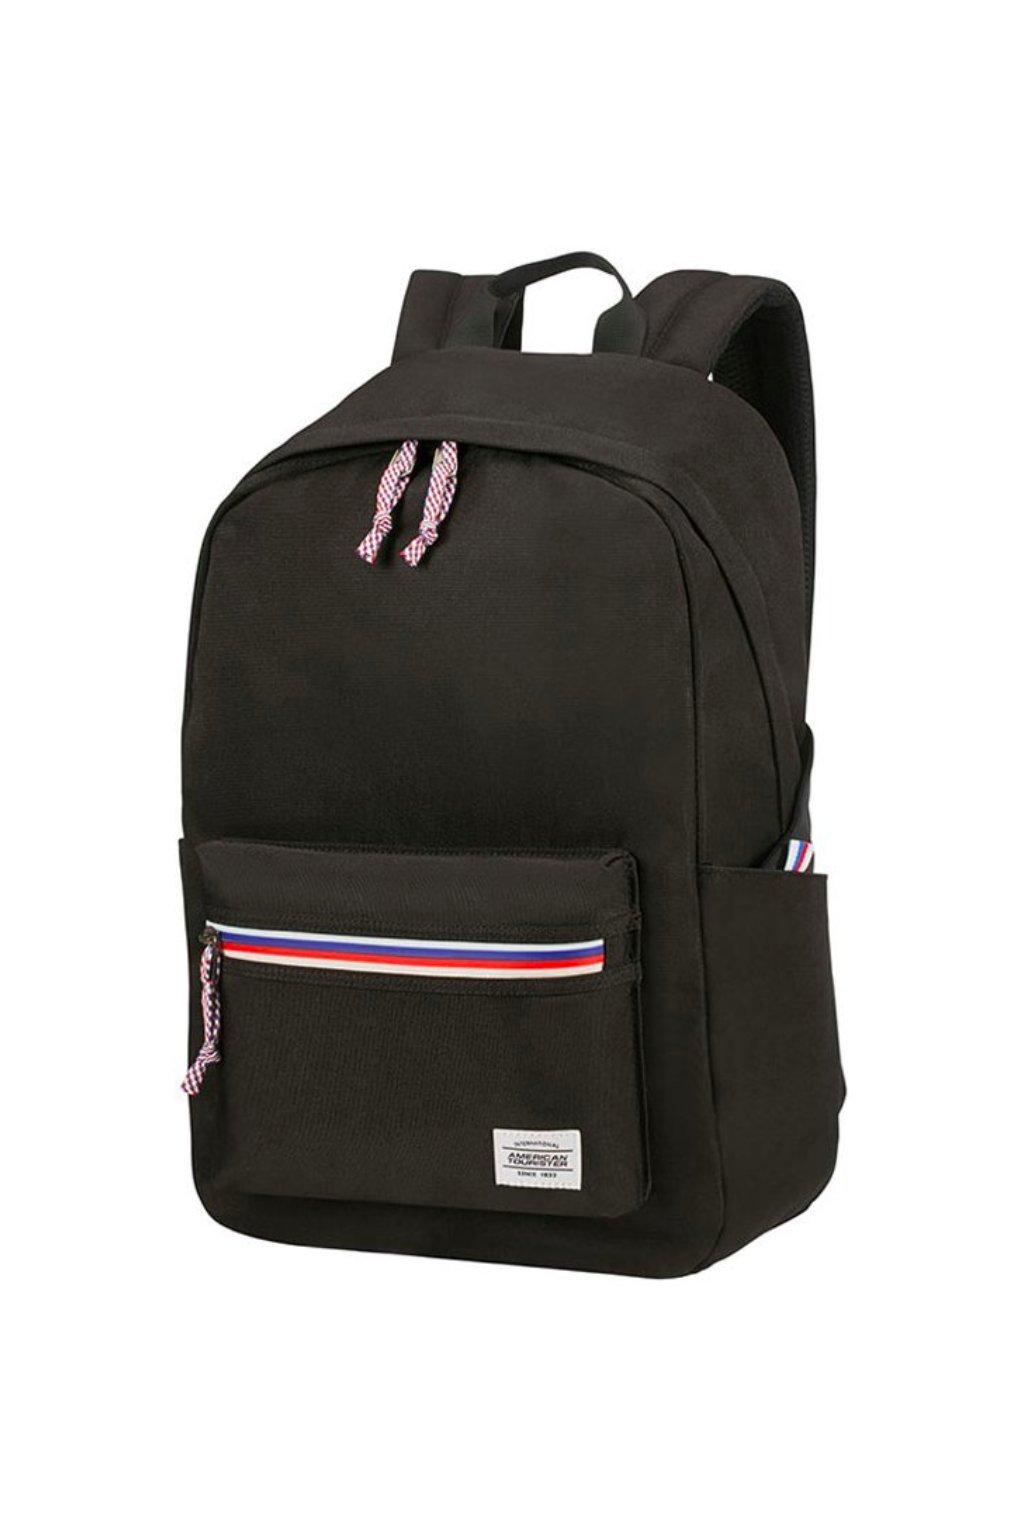 kufrland americantourister upbeat backpack black (11)